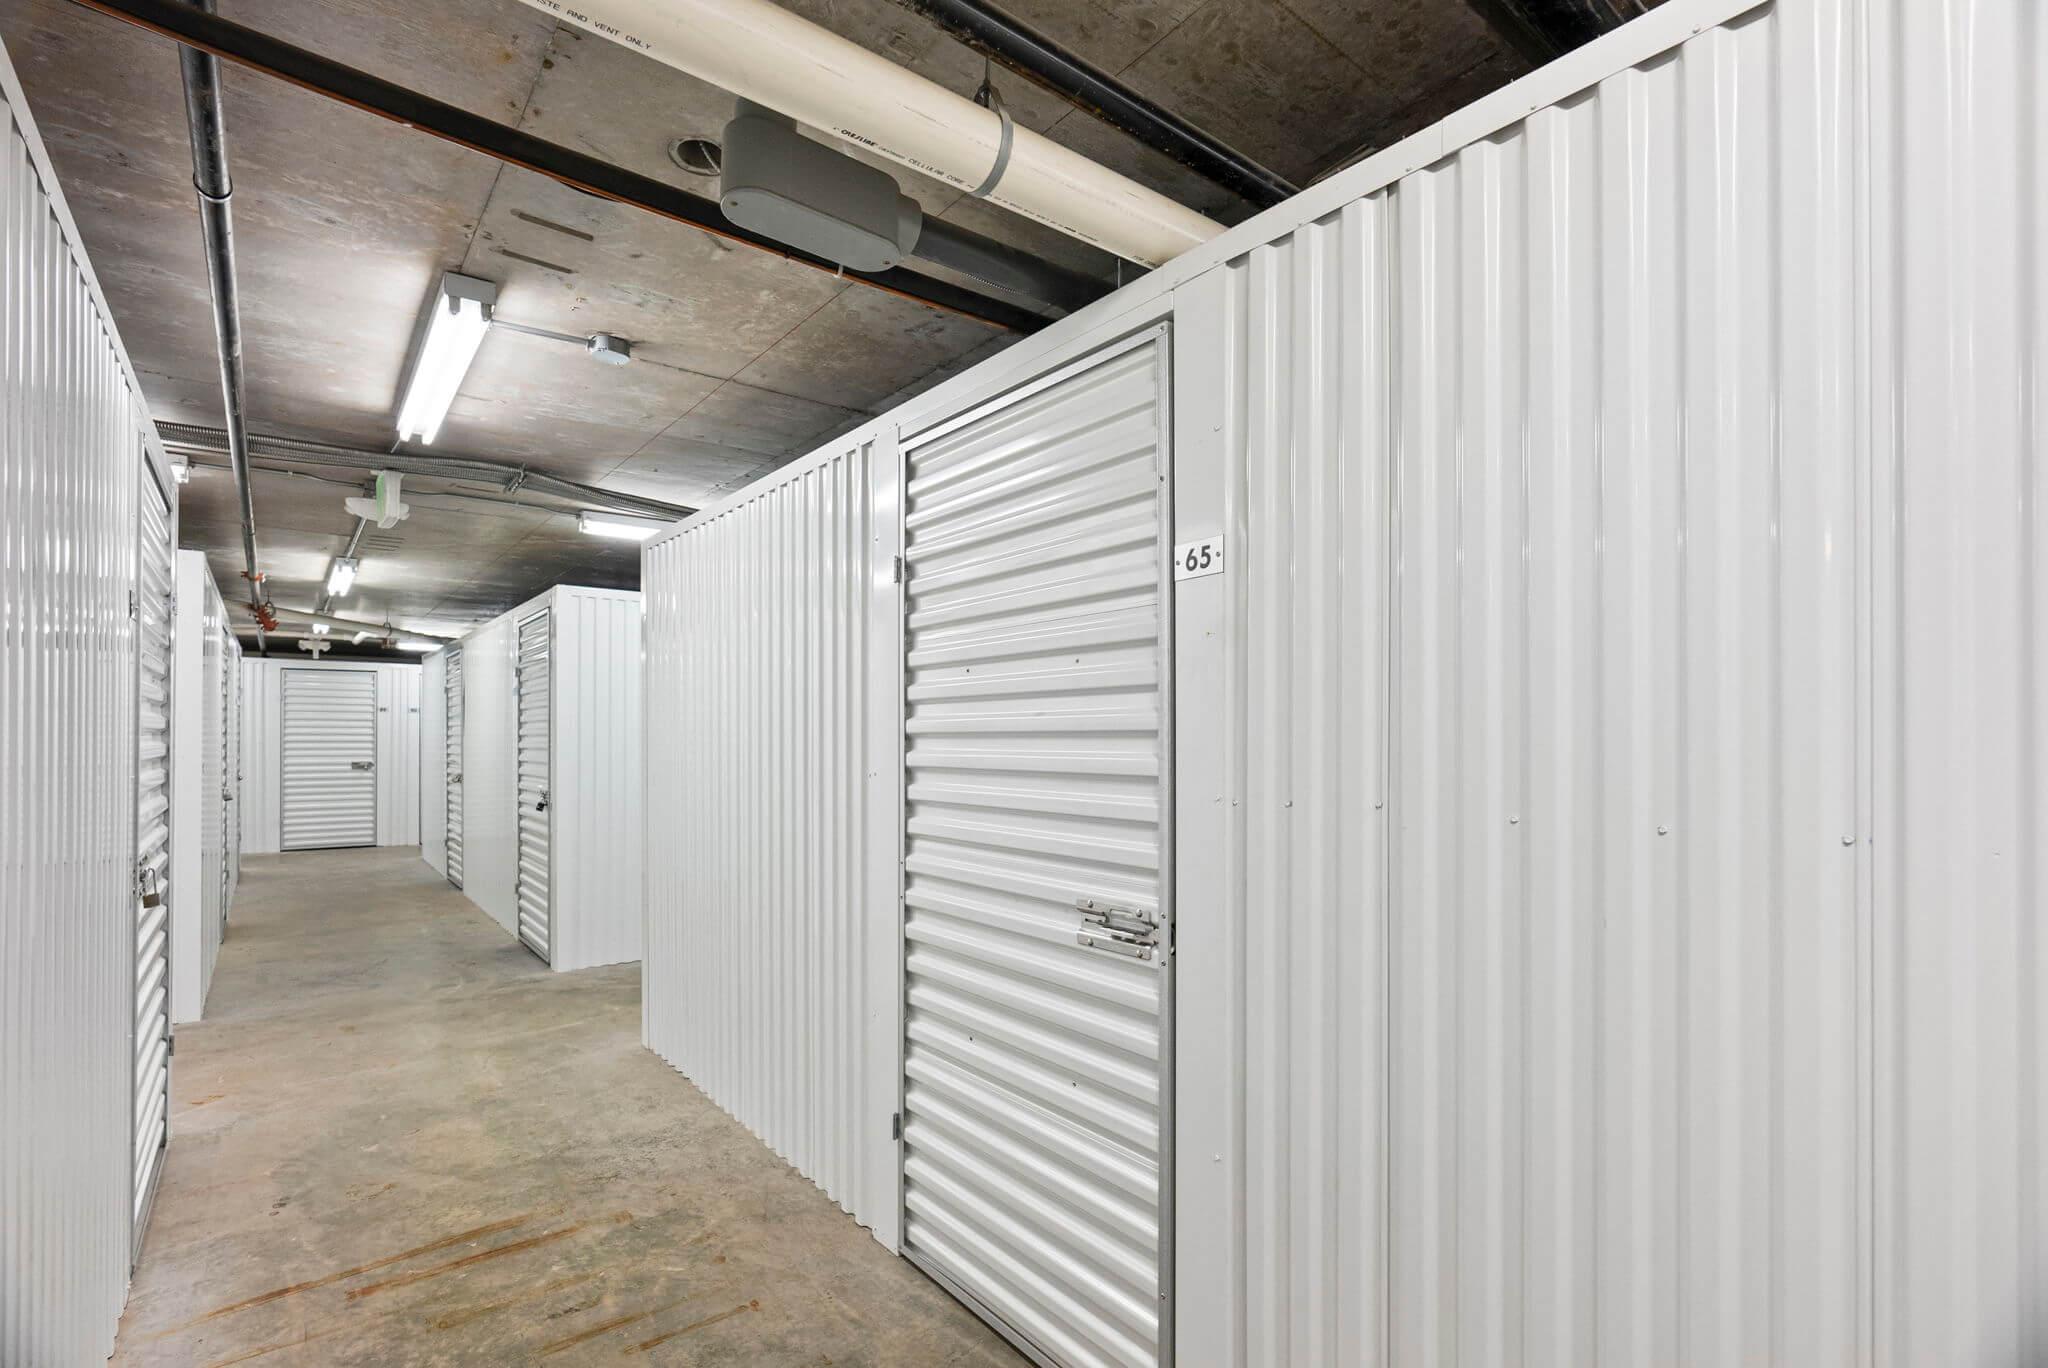 Unit comes with a private storage unit